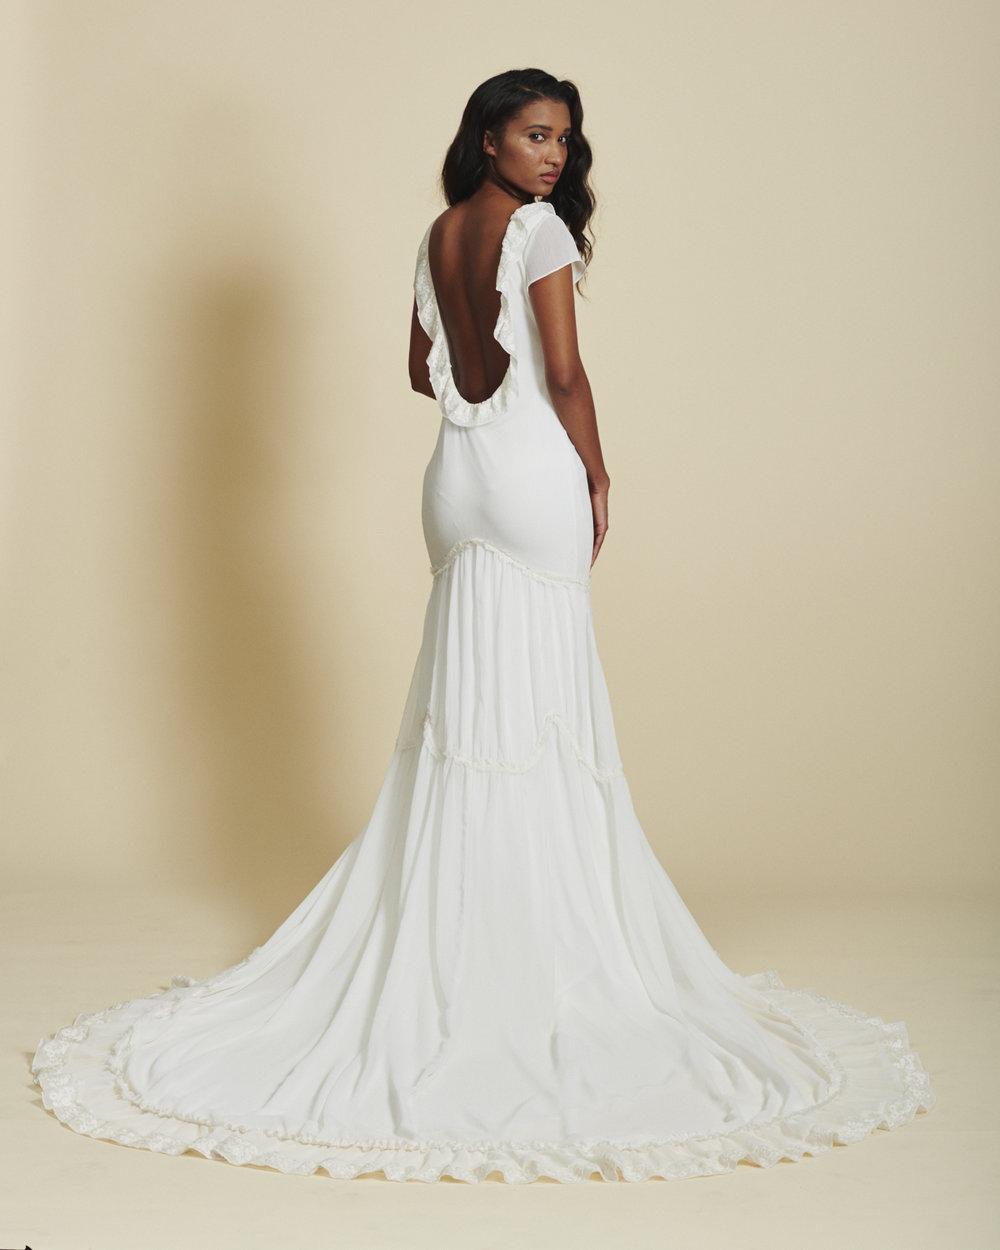 ruffle chiffon wedding dress by Daughters of Simone